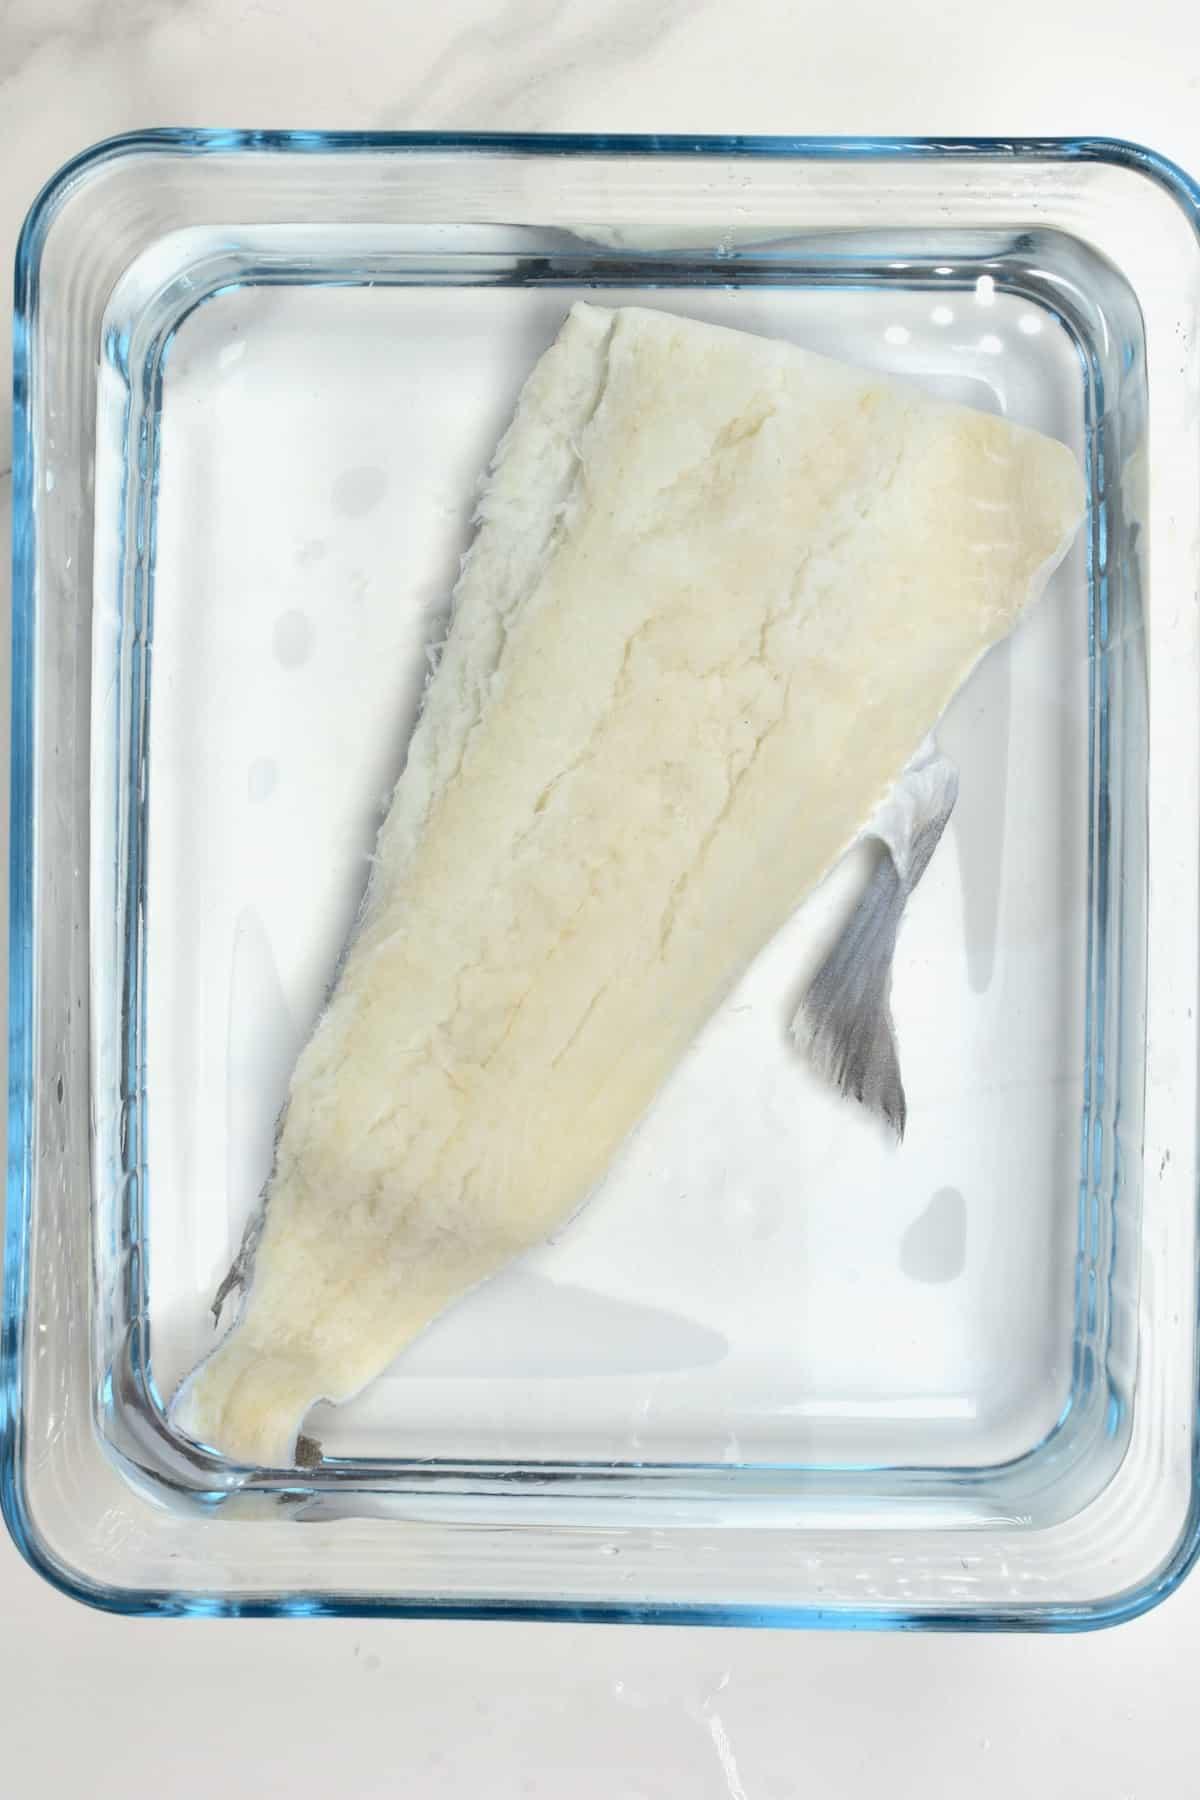 Soaking a cod fish in a bowl